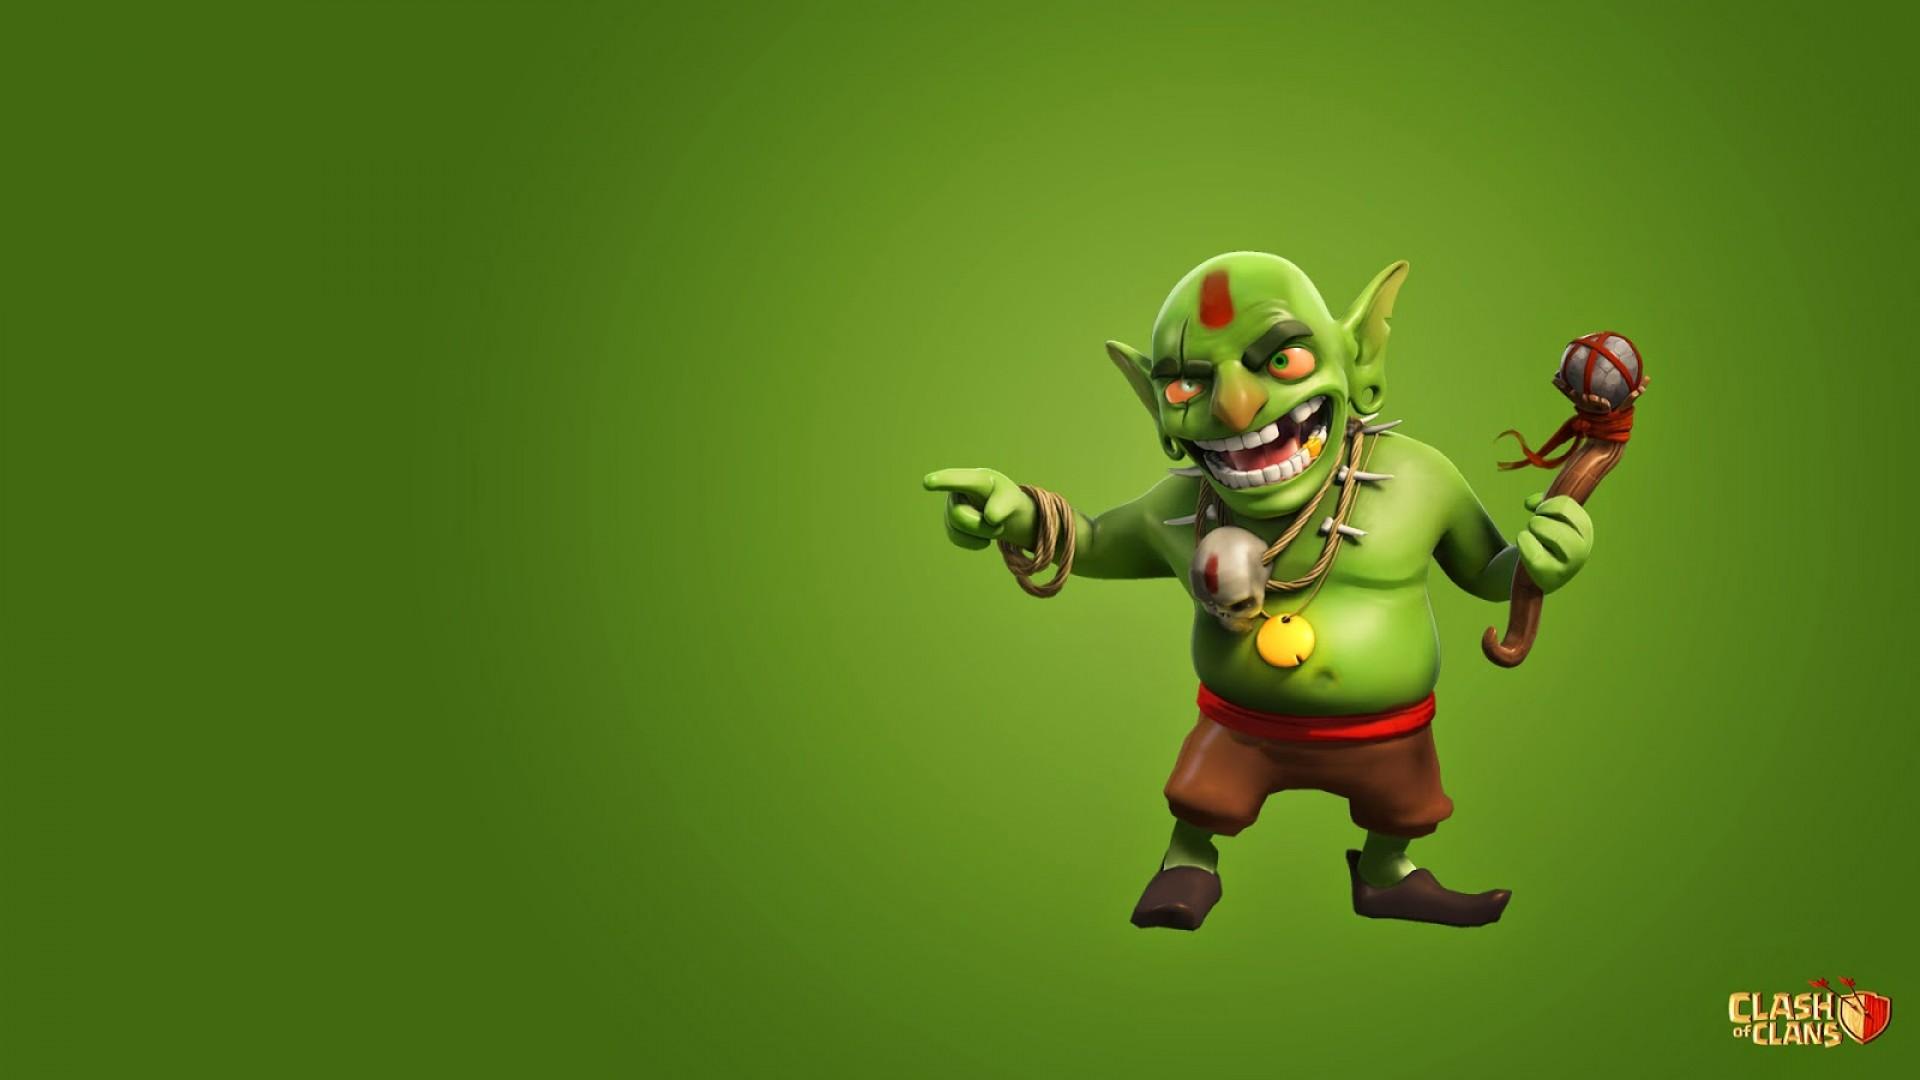 Free Download Clash Of Clans Goblin Full Hd Wallpaper For Desktop